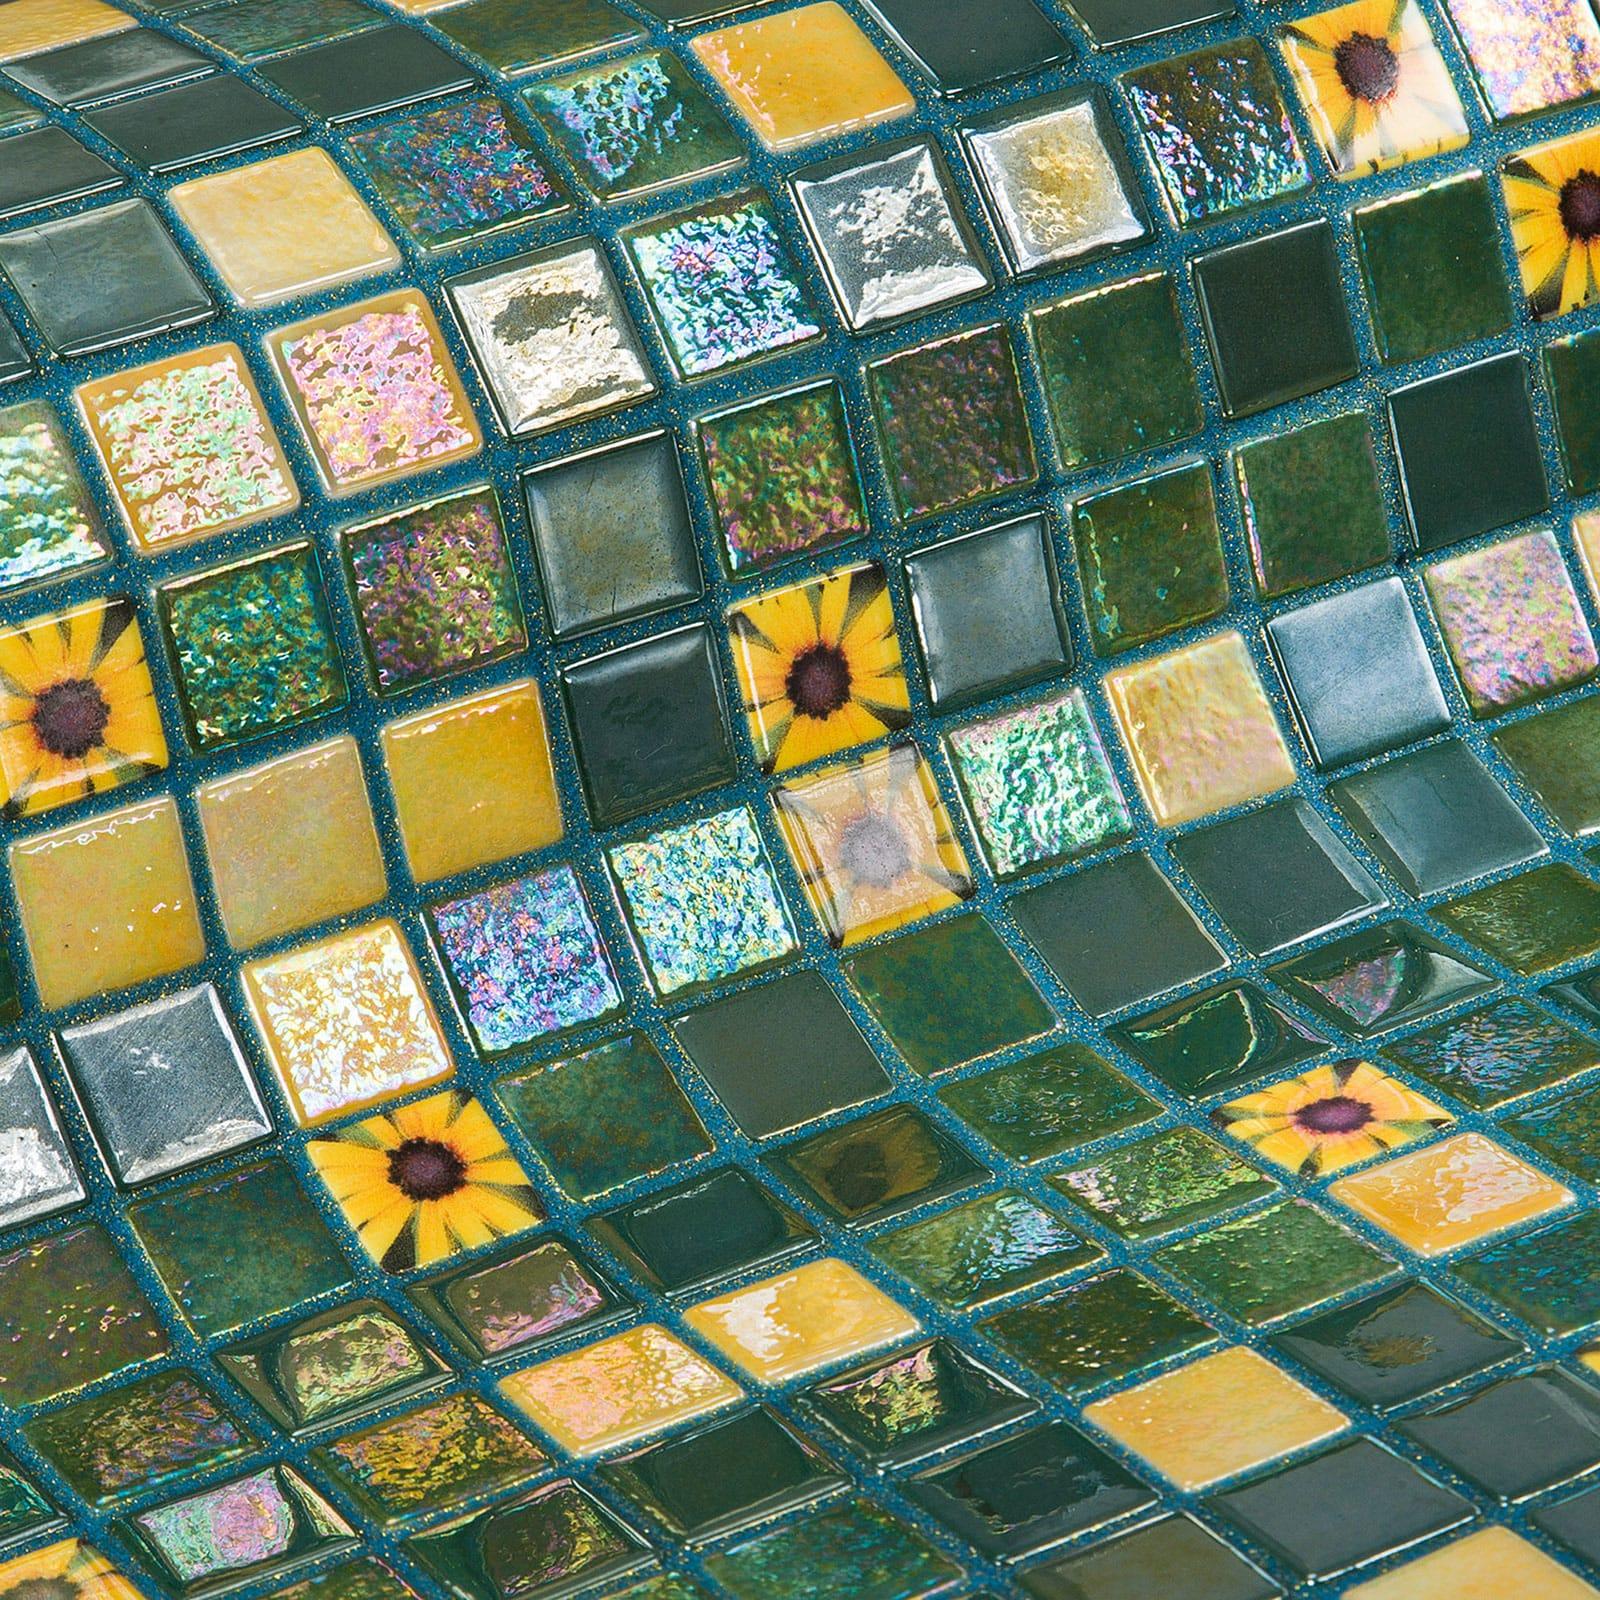 13-Marigold-Topping-Mosaic-Ezarri.jpg